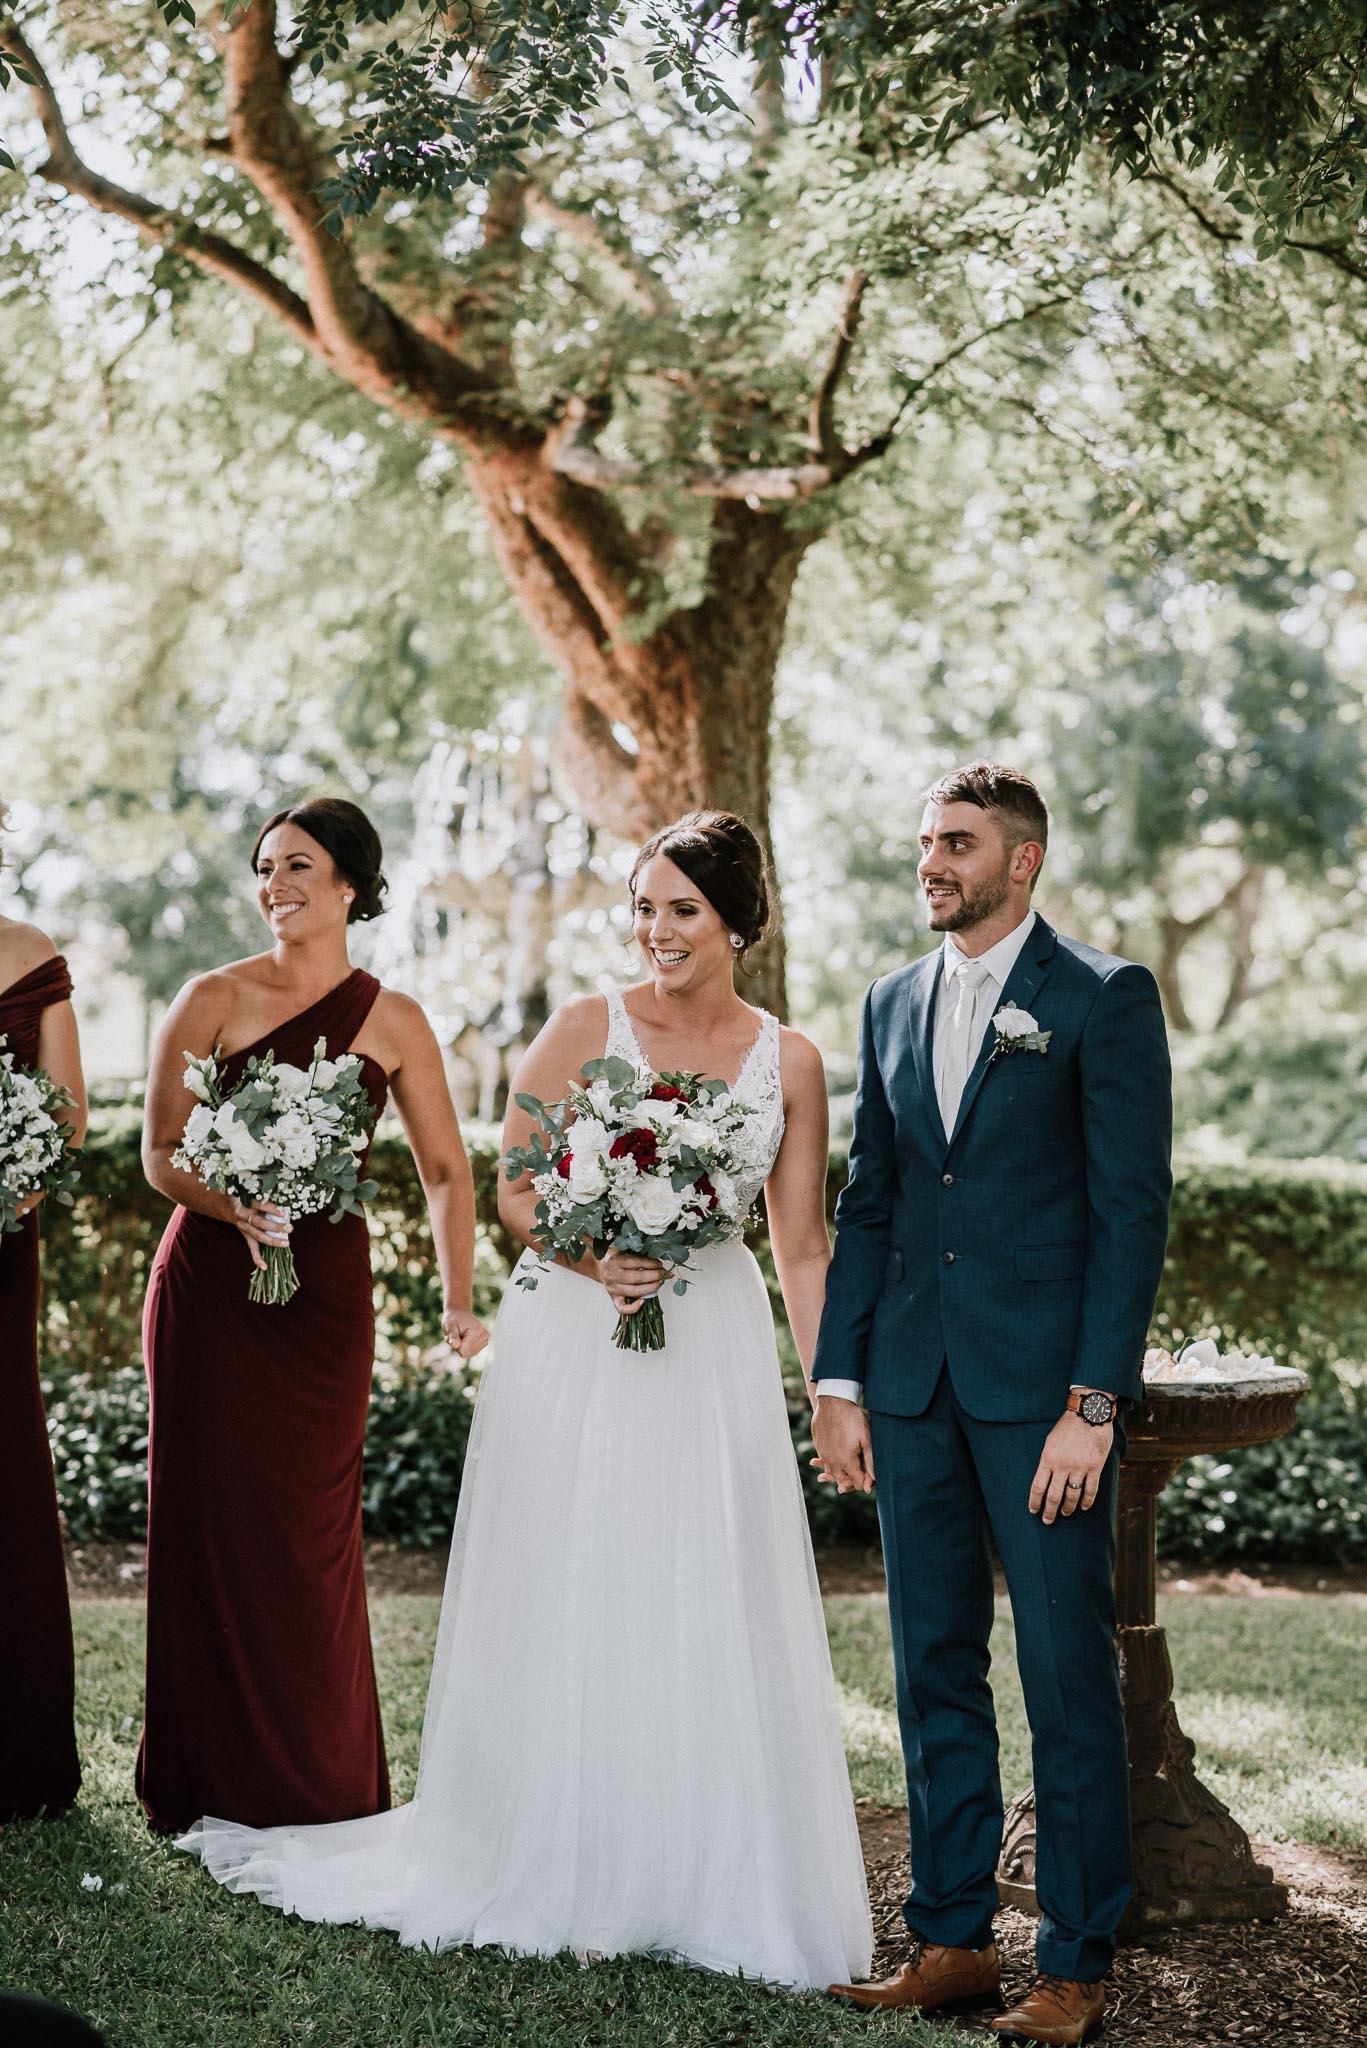 MECURE-RESORT-WEDDING-KING-WEB-84.jpg